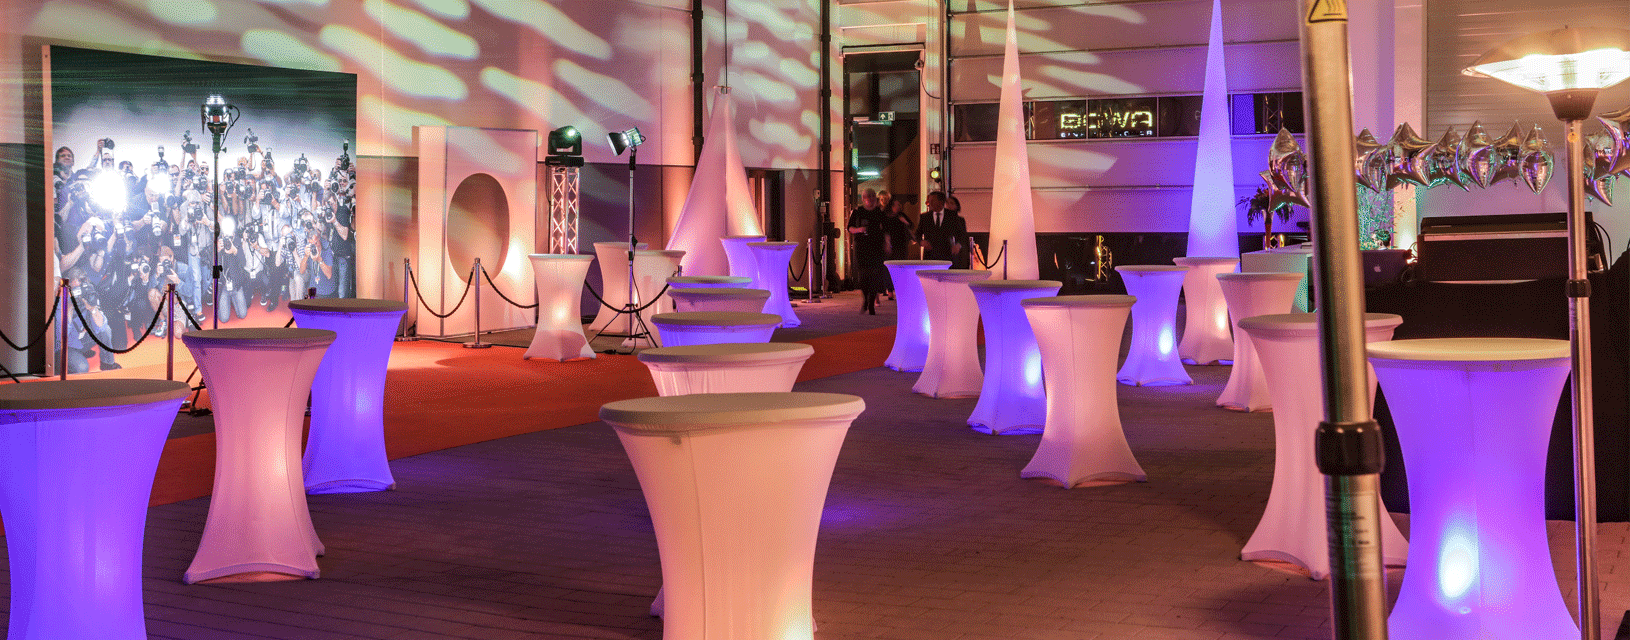 event-agentur-stuttgart-event